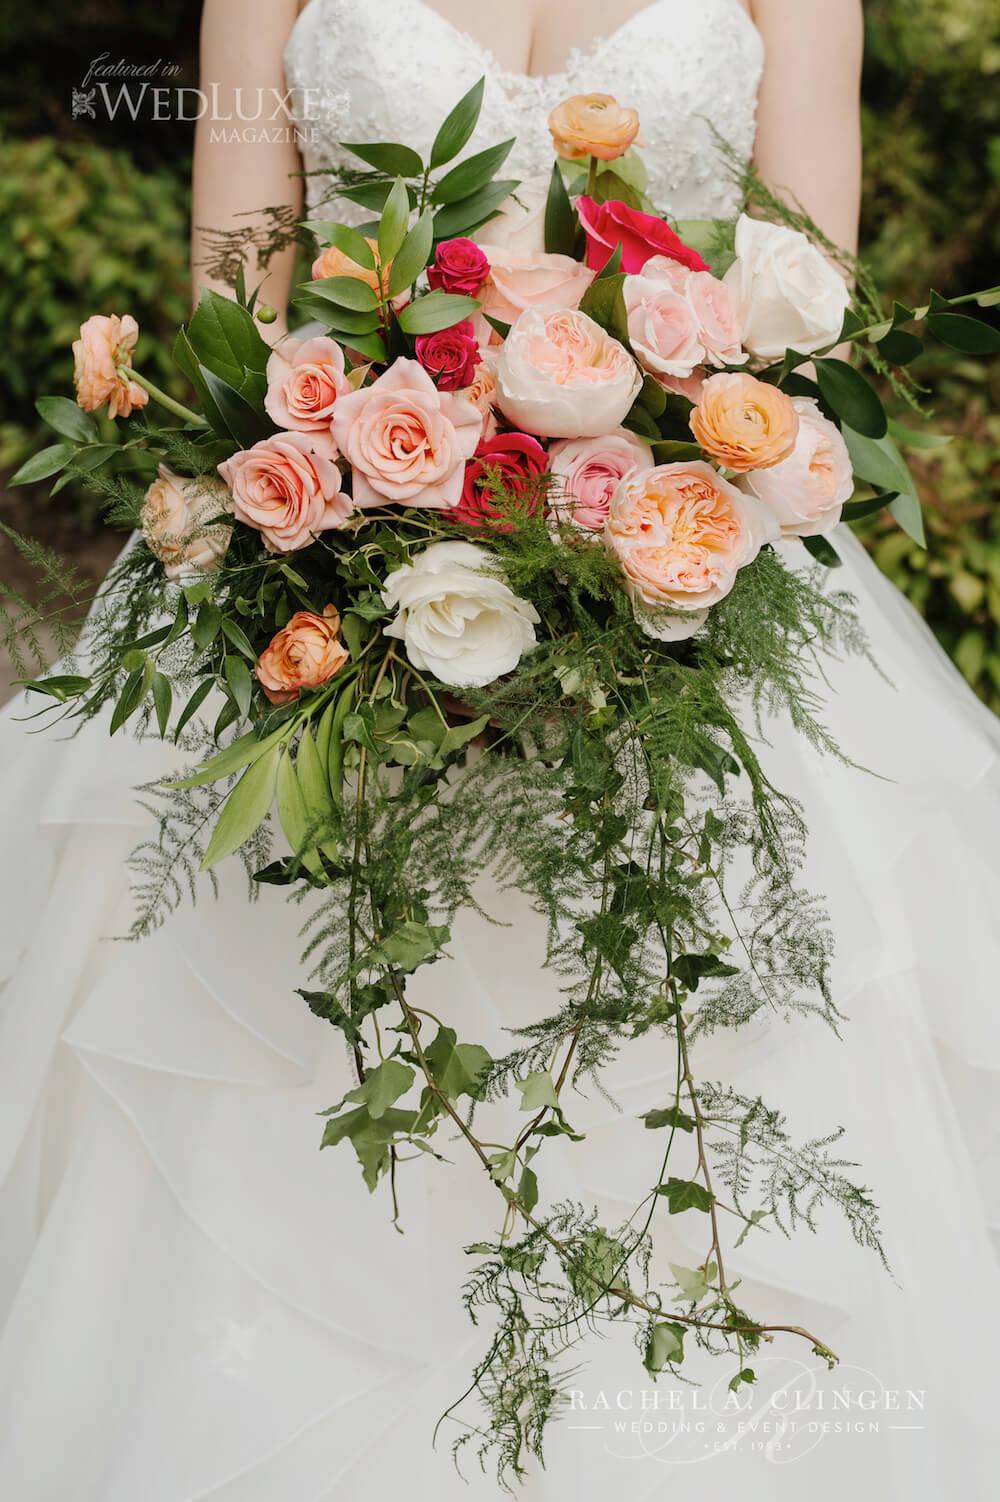 Luxury wedding flowers bouquet wedding decor toronto rachel a luxury wedding flowers bouquet izmirmasajfo